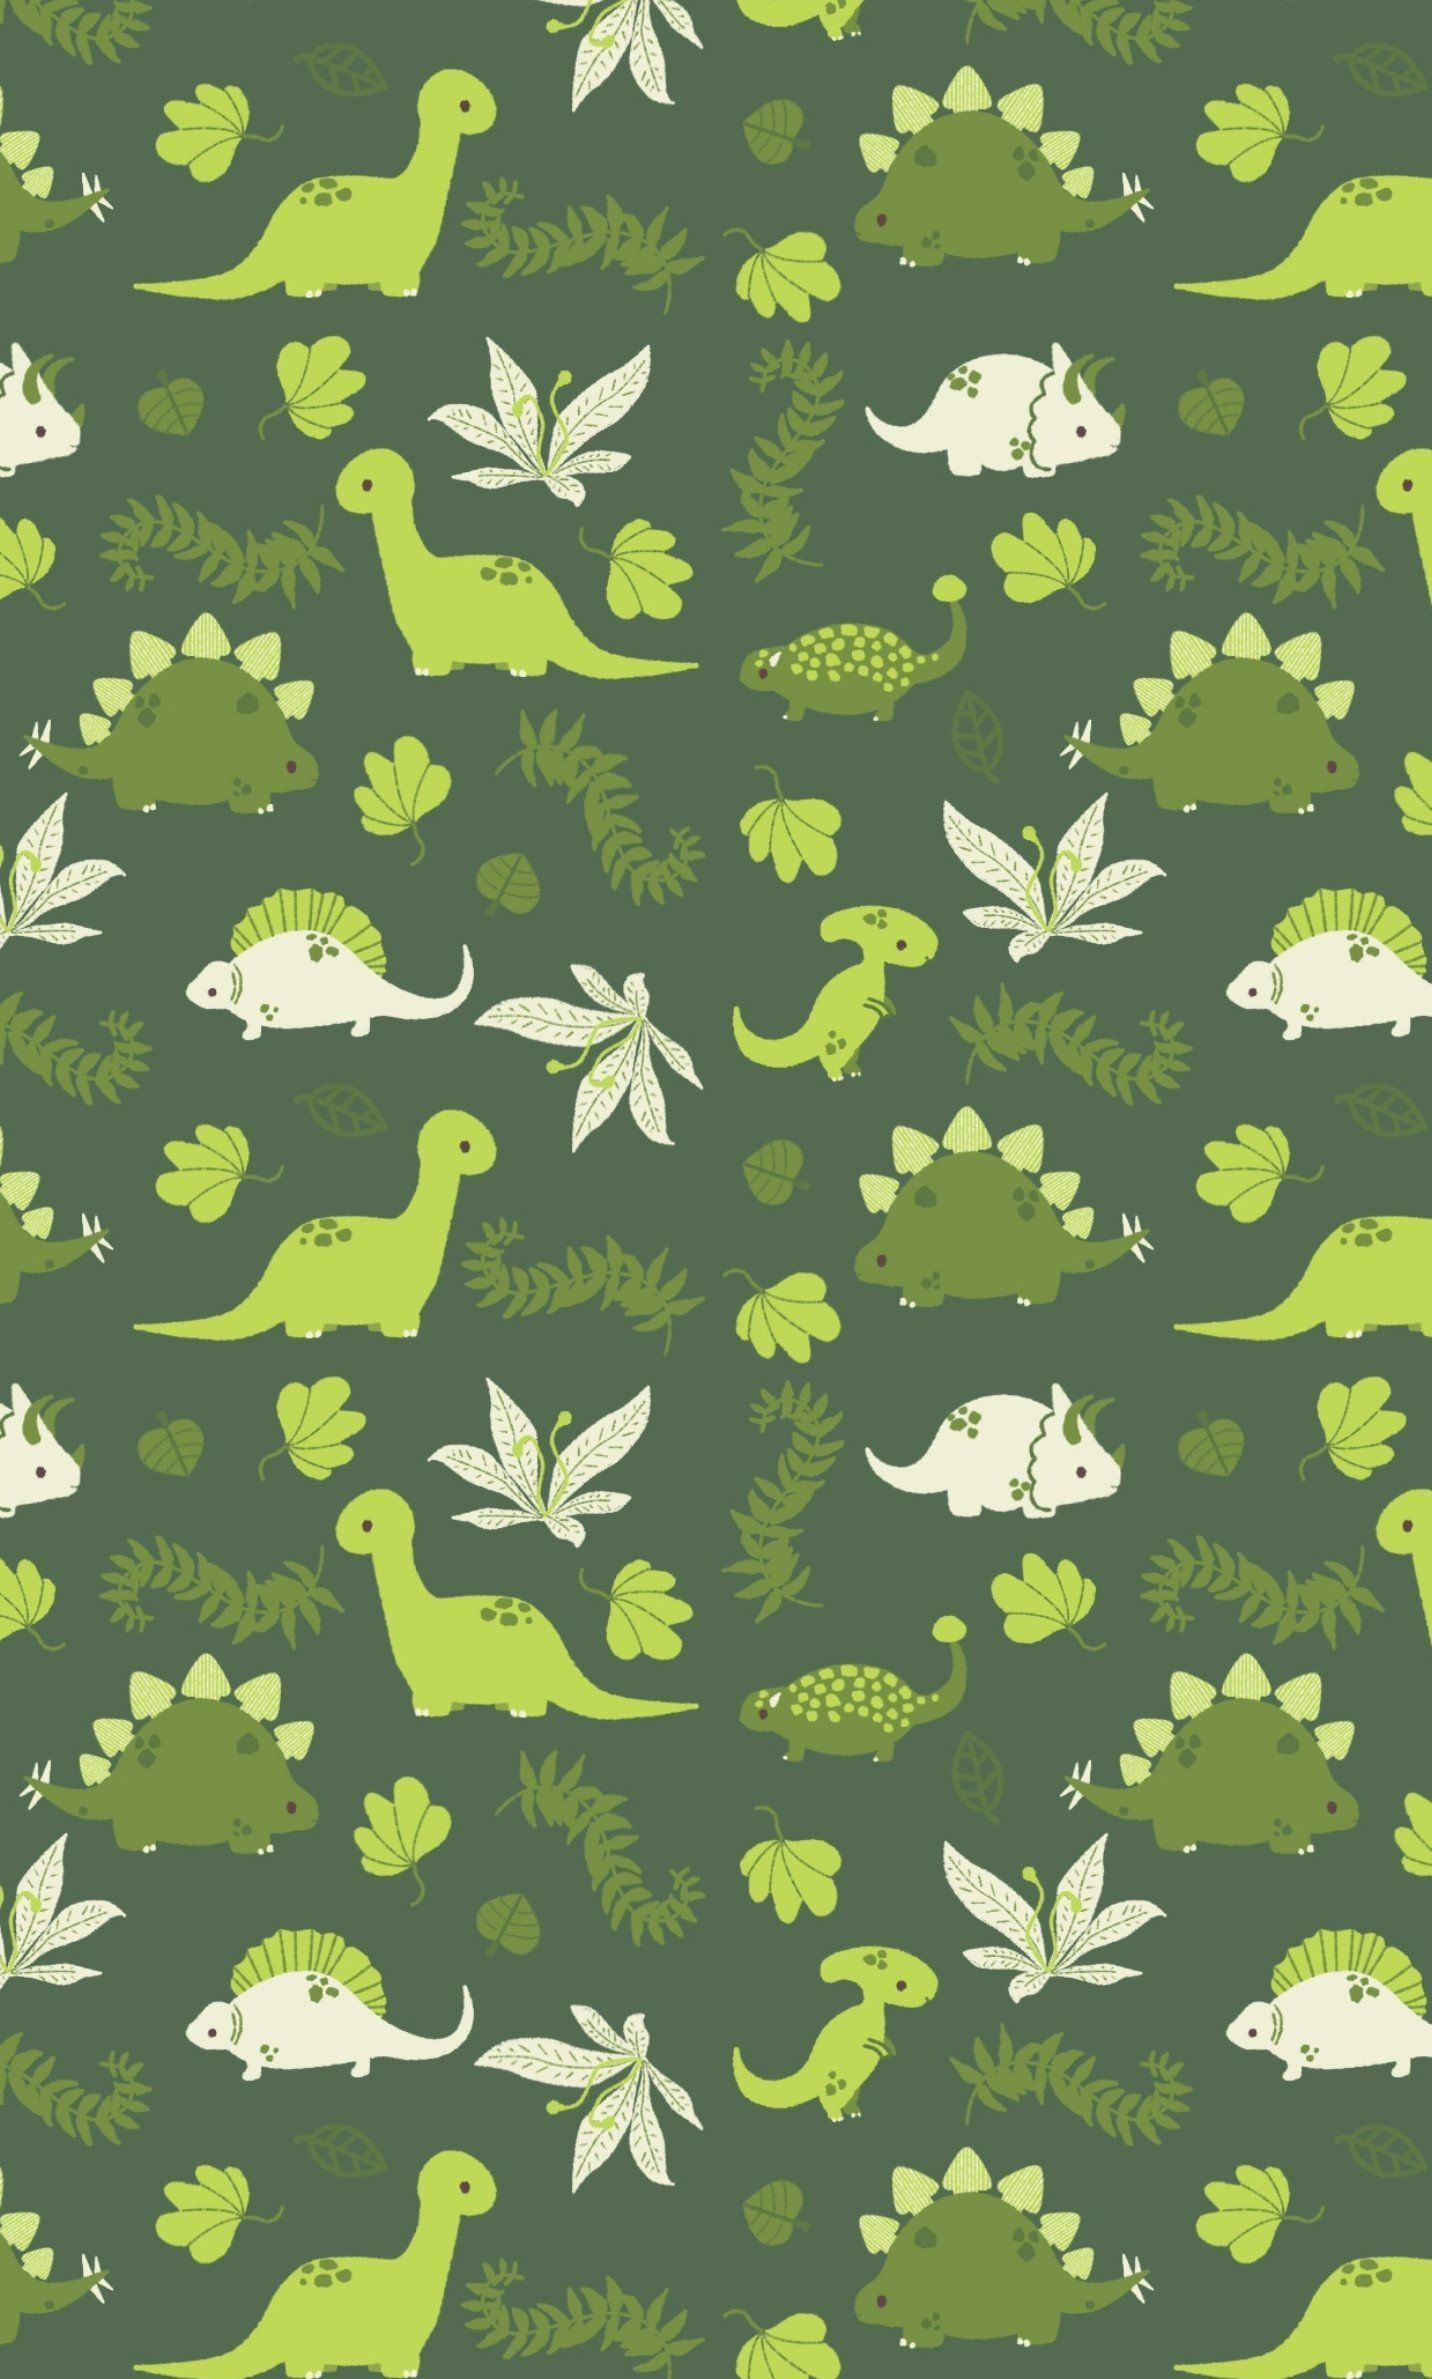 4kphonewallpapersreddit Cute Dinosaurs Iphonewallpapersreddit Phone Phonebackgroundsaestheti Dinosaur Wallpaper Dinosaur Background Wallpaper Iphone Cute